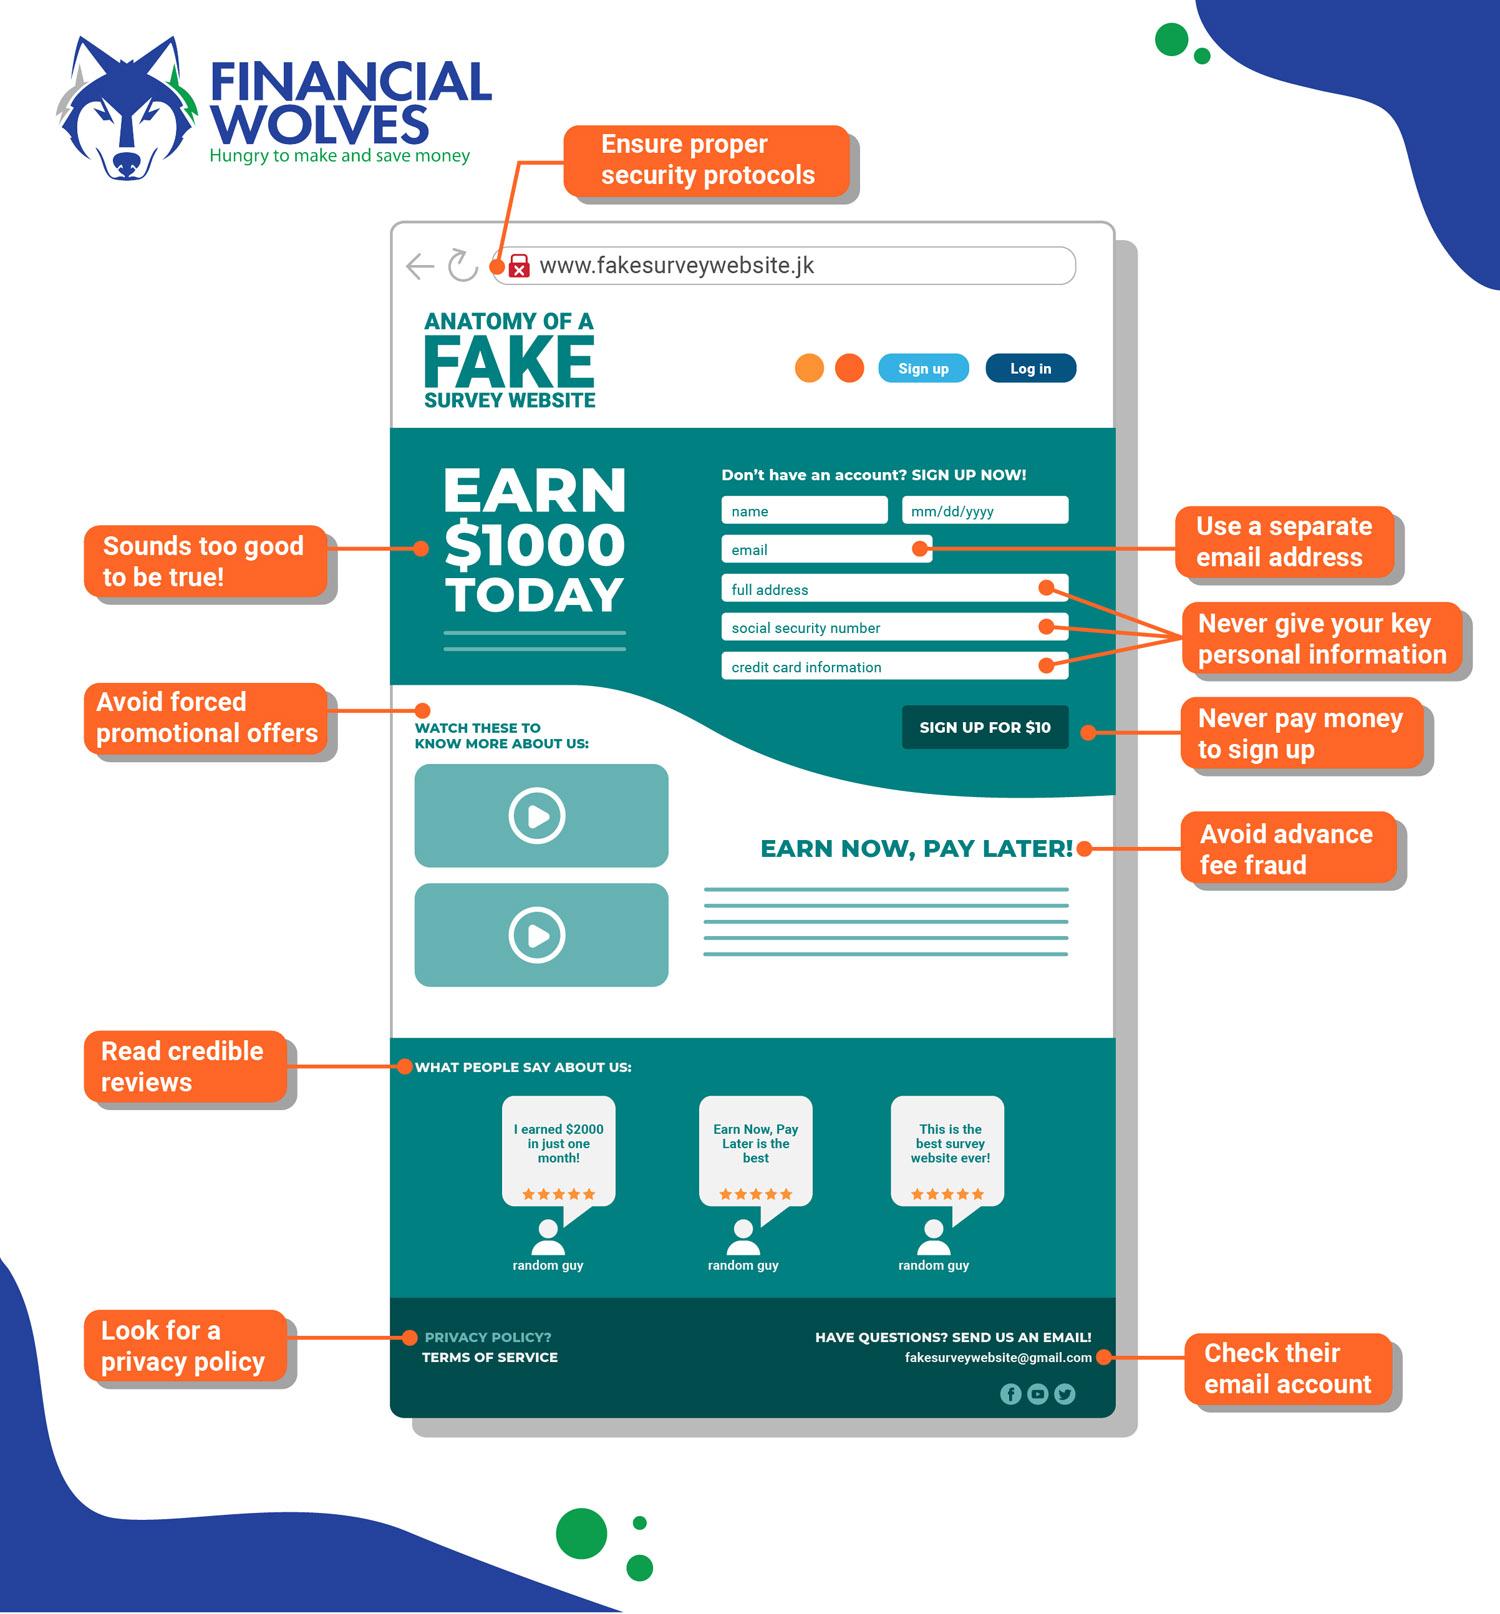 Anatomy of a Scam Survey Website